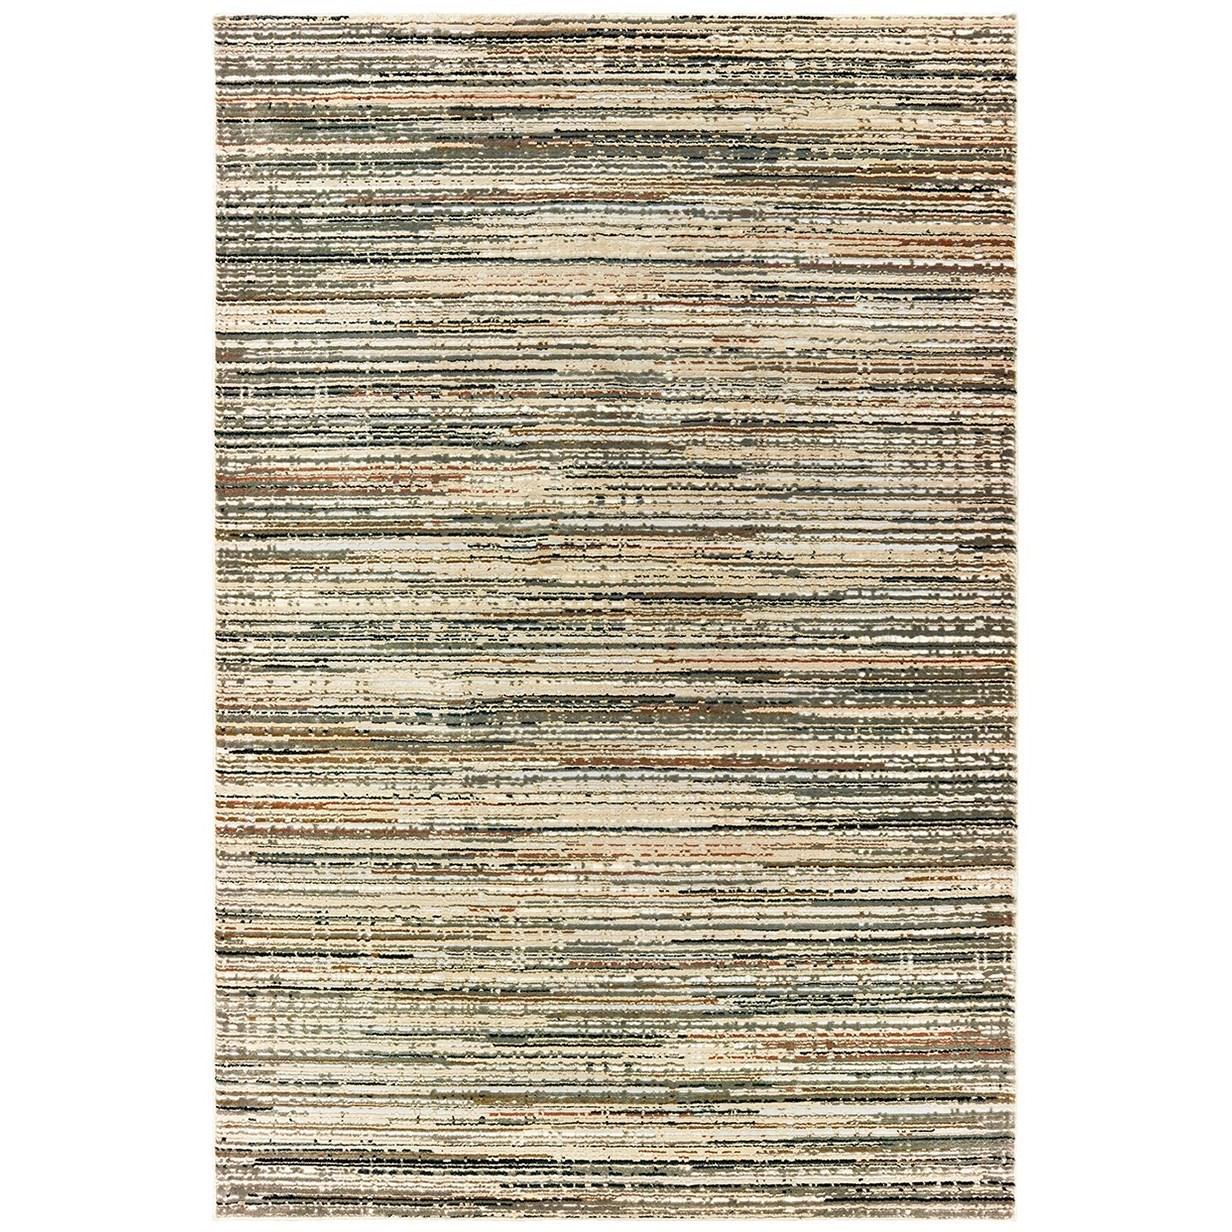 "Bowen 7'10"" X 10'10"" Rug by Oriental Weavers at HomeWorld Furniture"